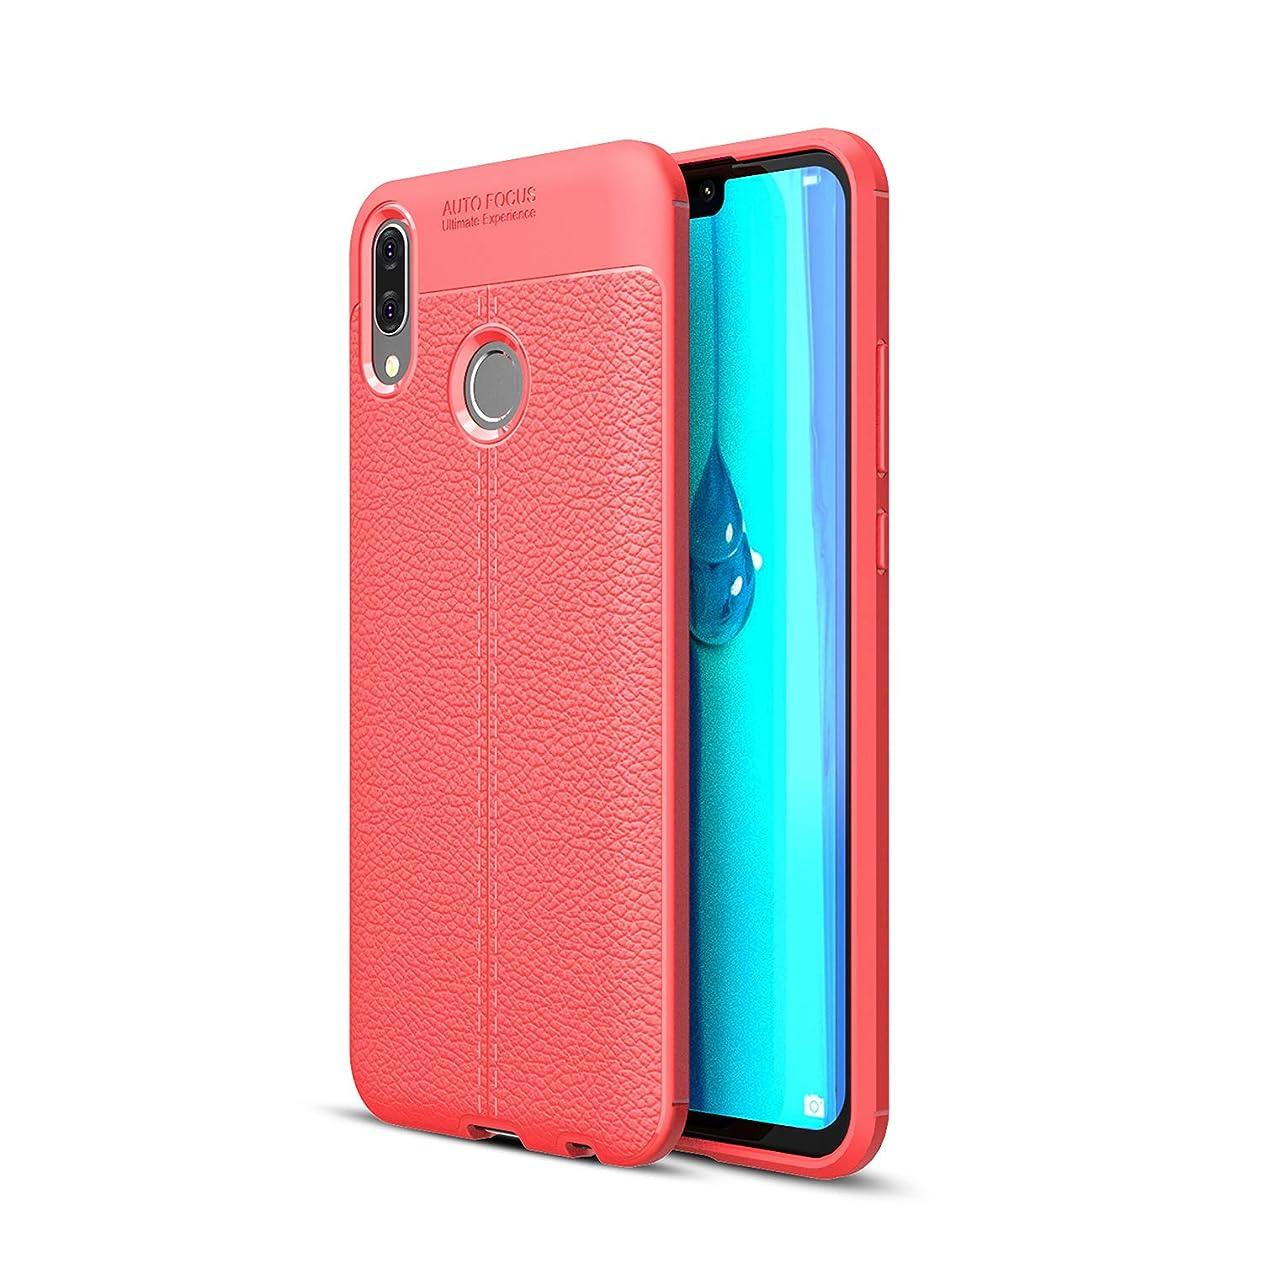 Huawei Y9 2019 Case, SsHhUu Soft TPU PU Leather Silicon Anti-Scratch Shock Absorption Flexible Thin Clear Luxury Stylish Cover for Huawei Y9 2019 (6.5